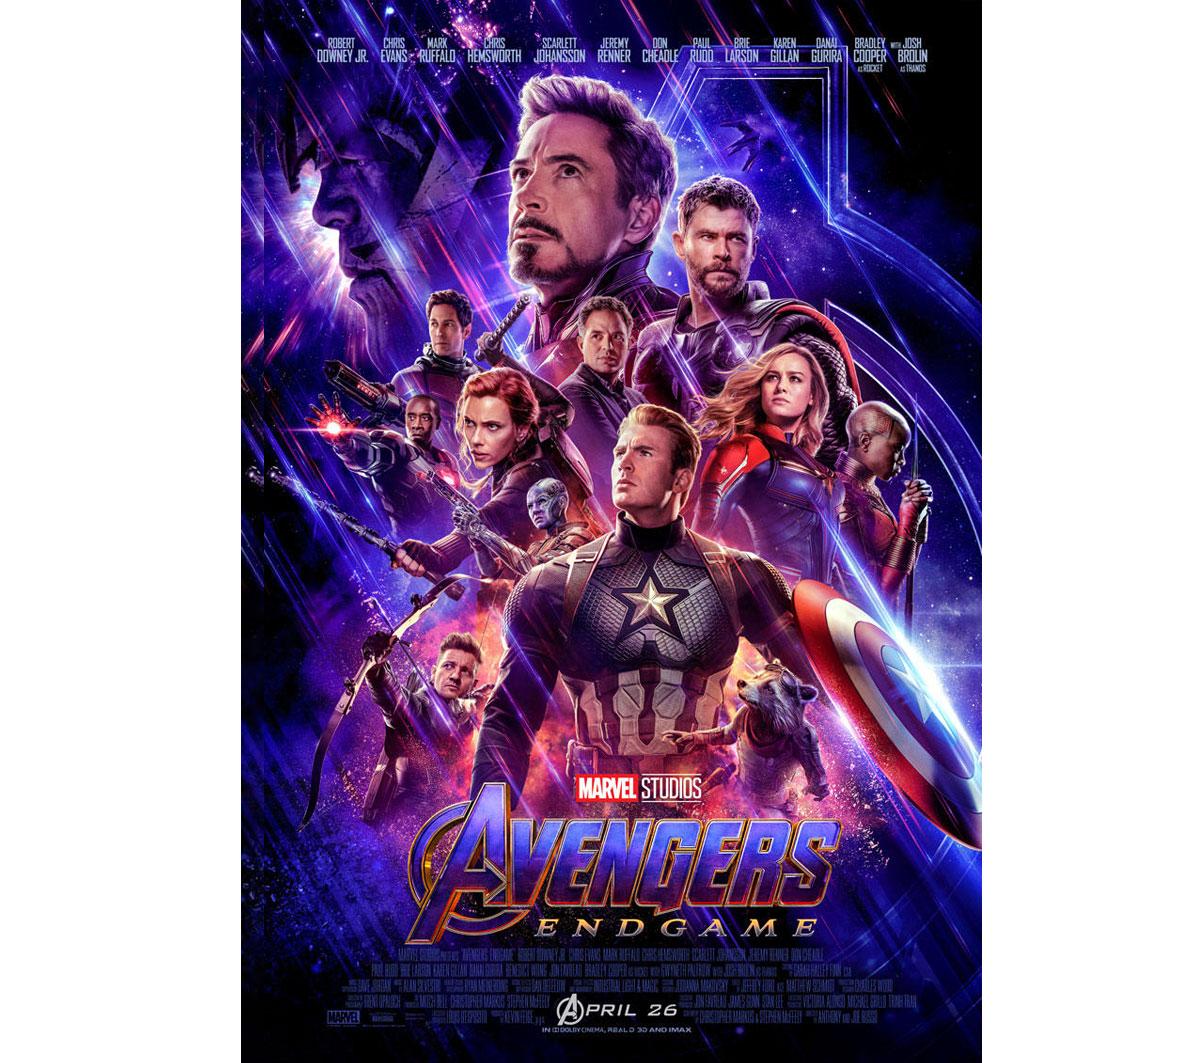 Avengers Endgame critique sans spoilers - Marvel Studios Disney